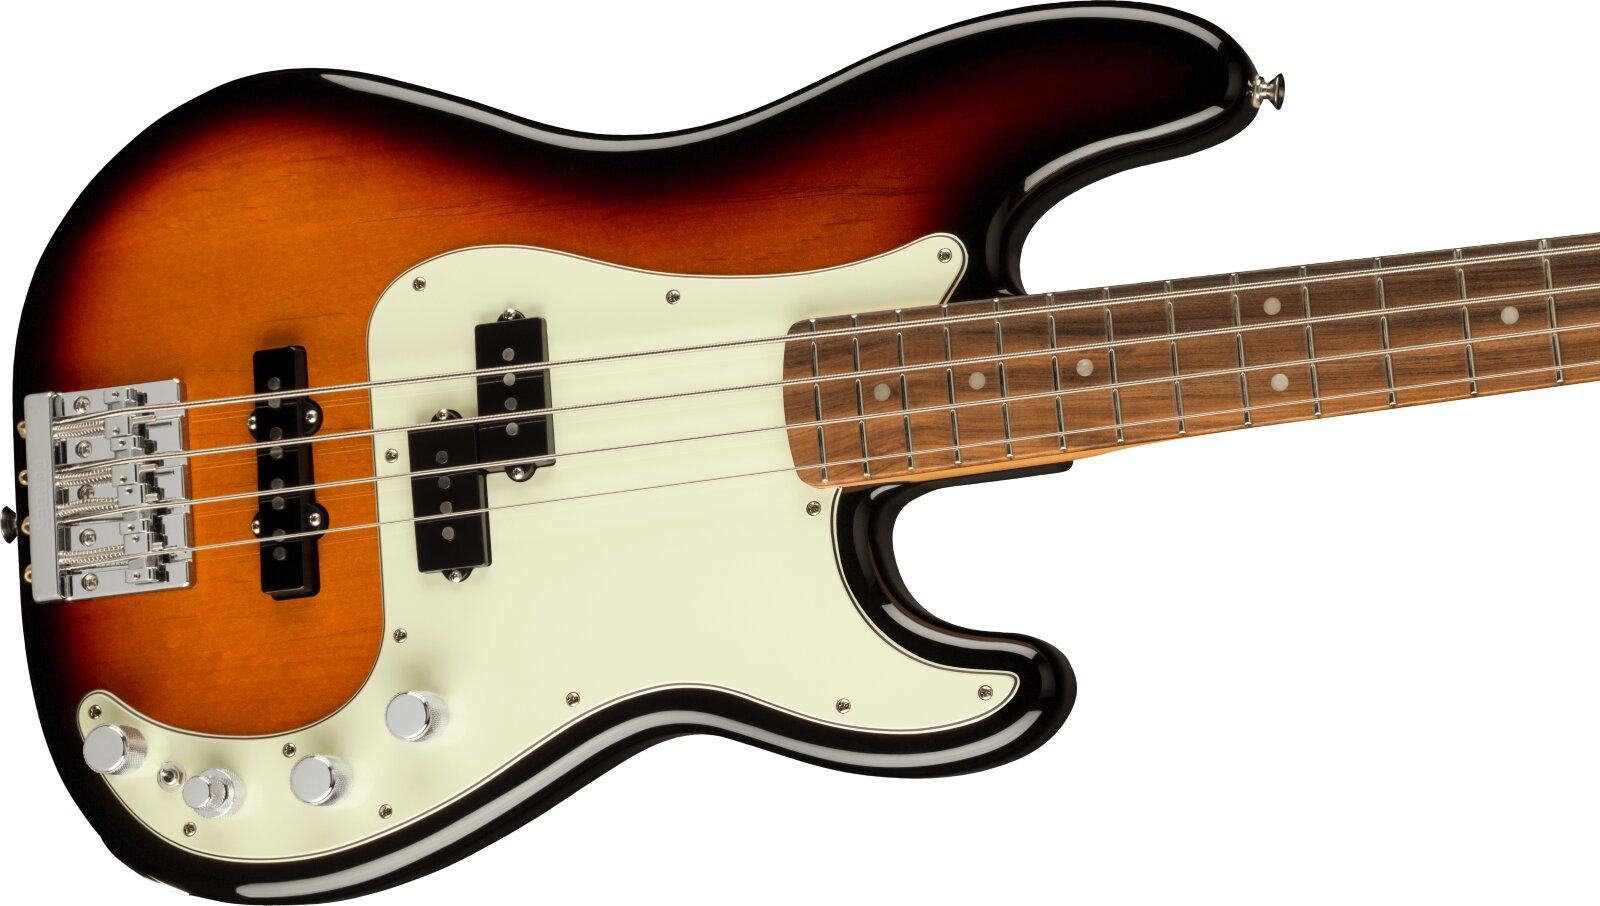 Fender Player Plus Precision Bass Pau Ferro Fingerboard, 3-Color Sunburst : photo 3